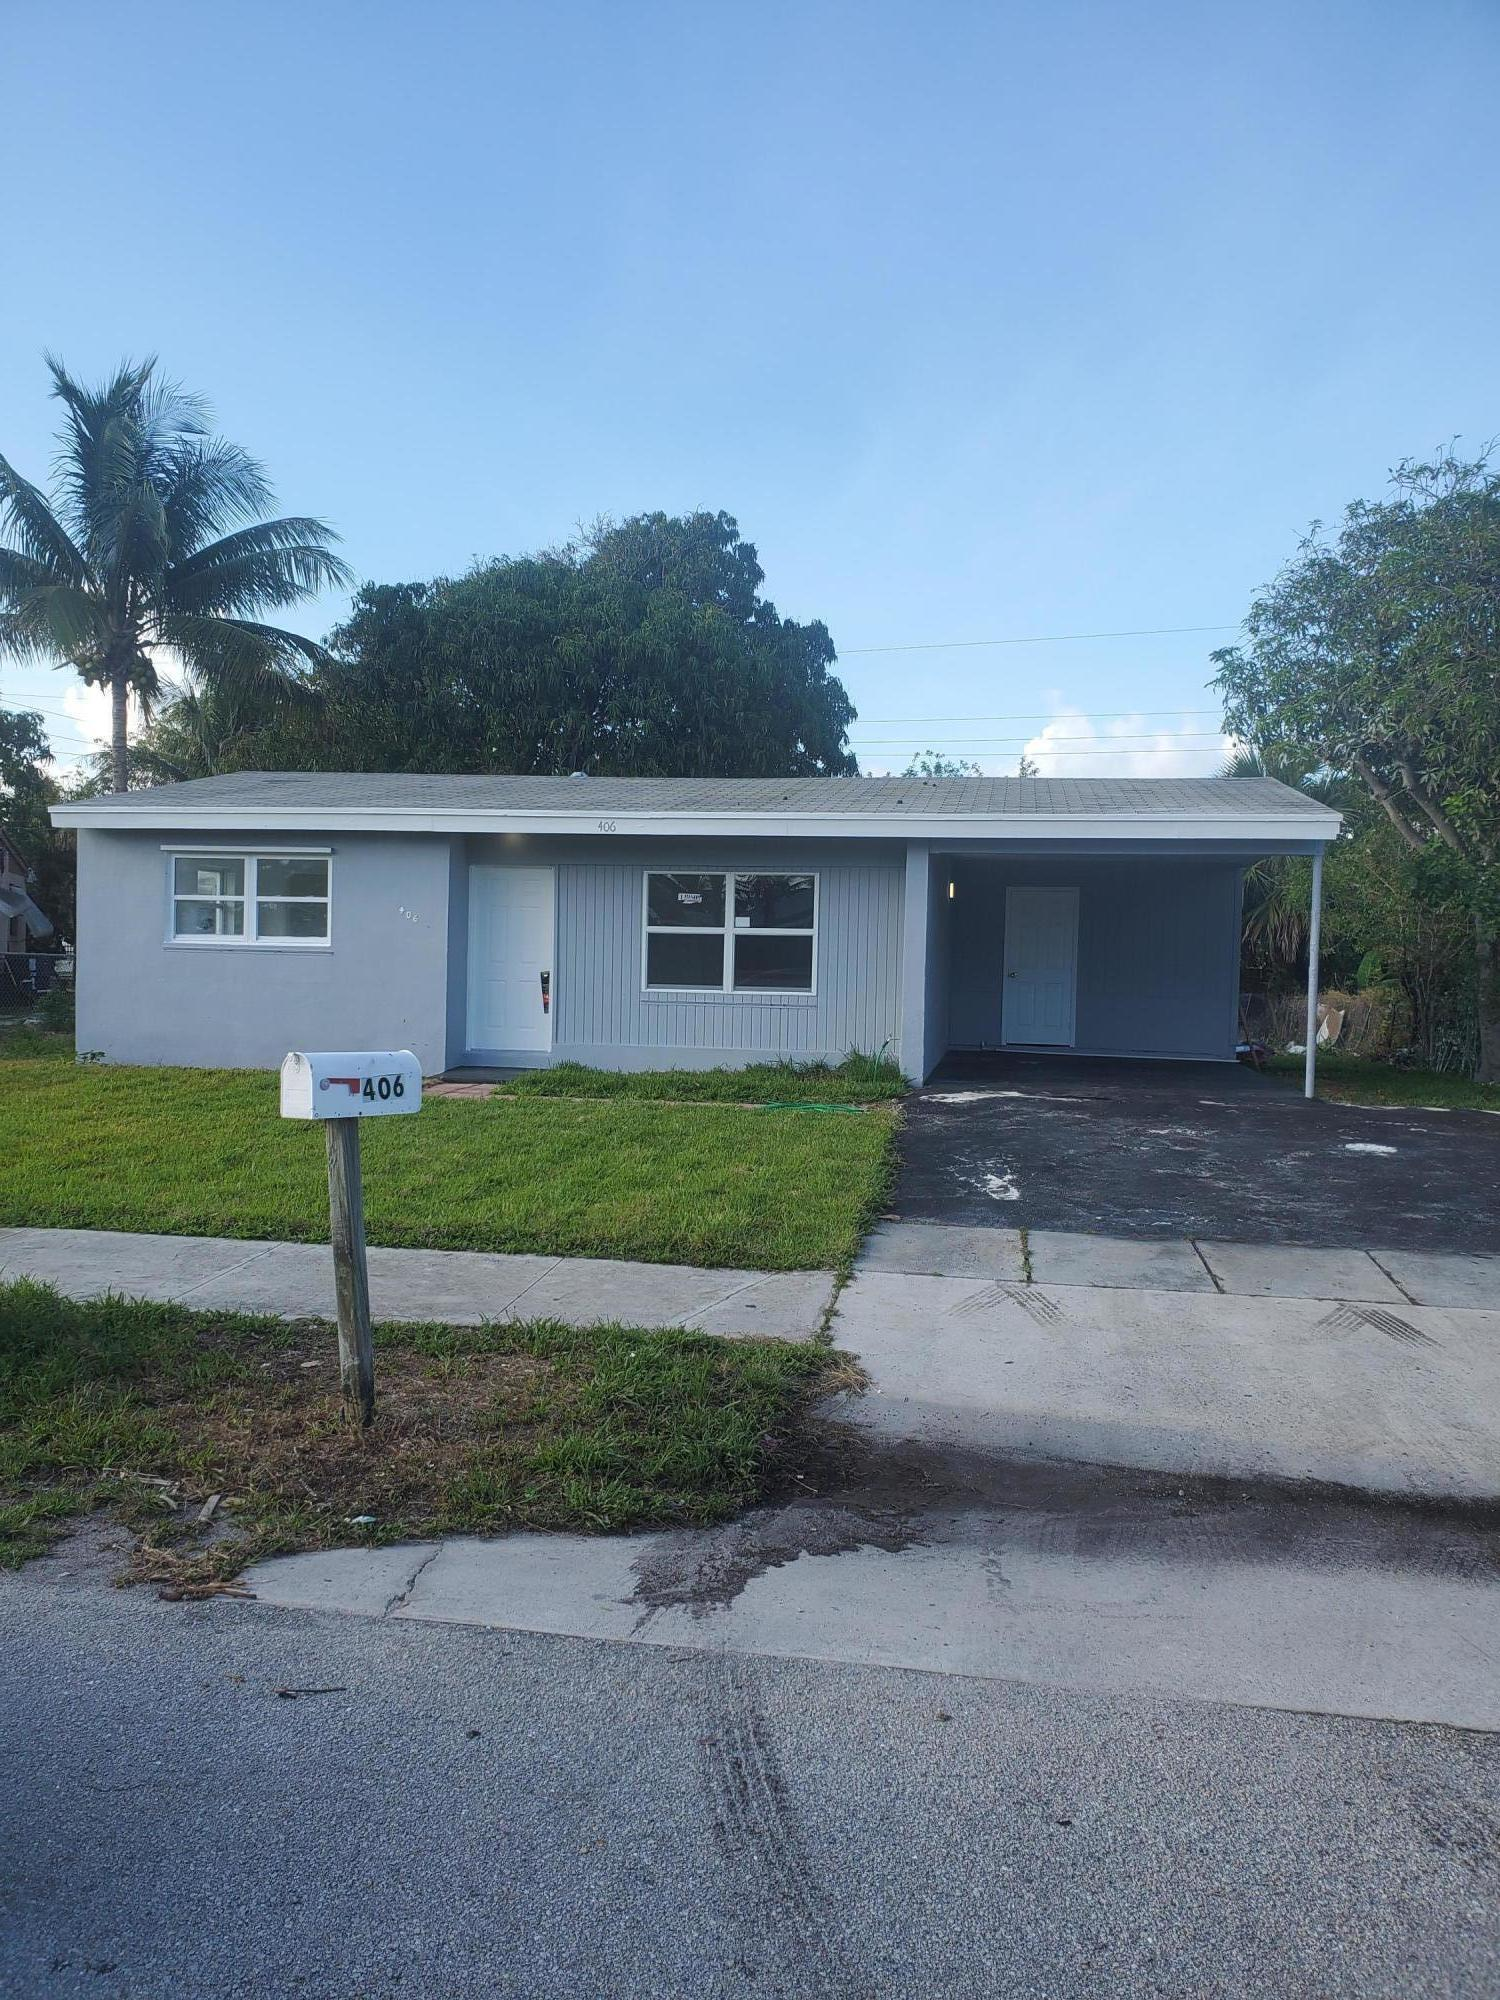 406 SW 9th Street  For Sale 10721129, FL